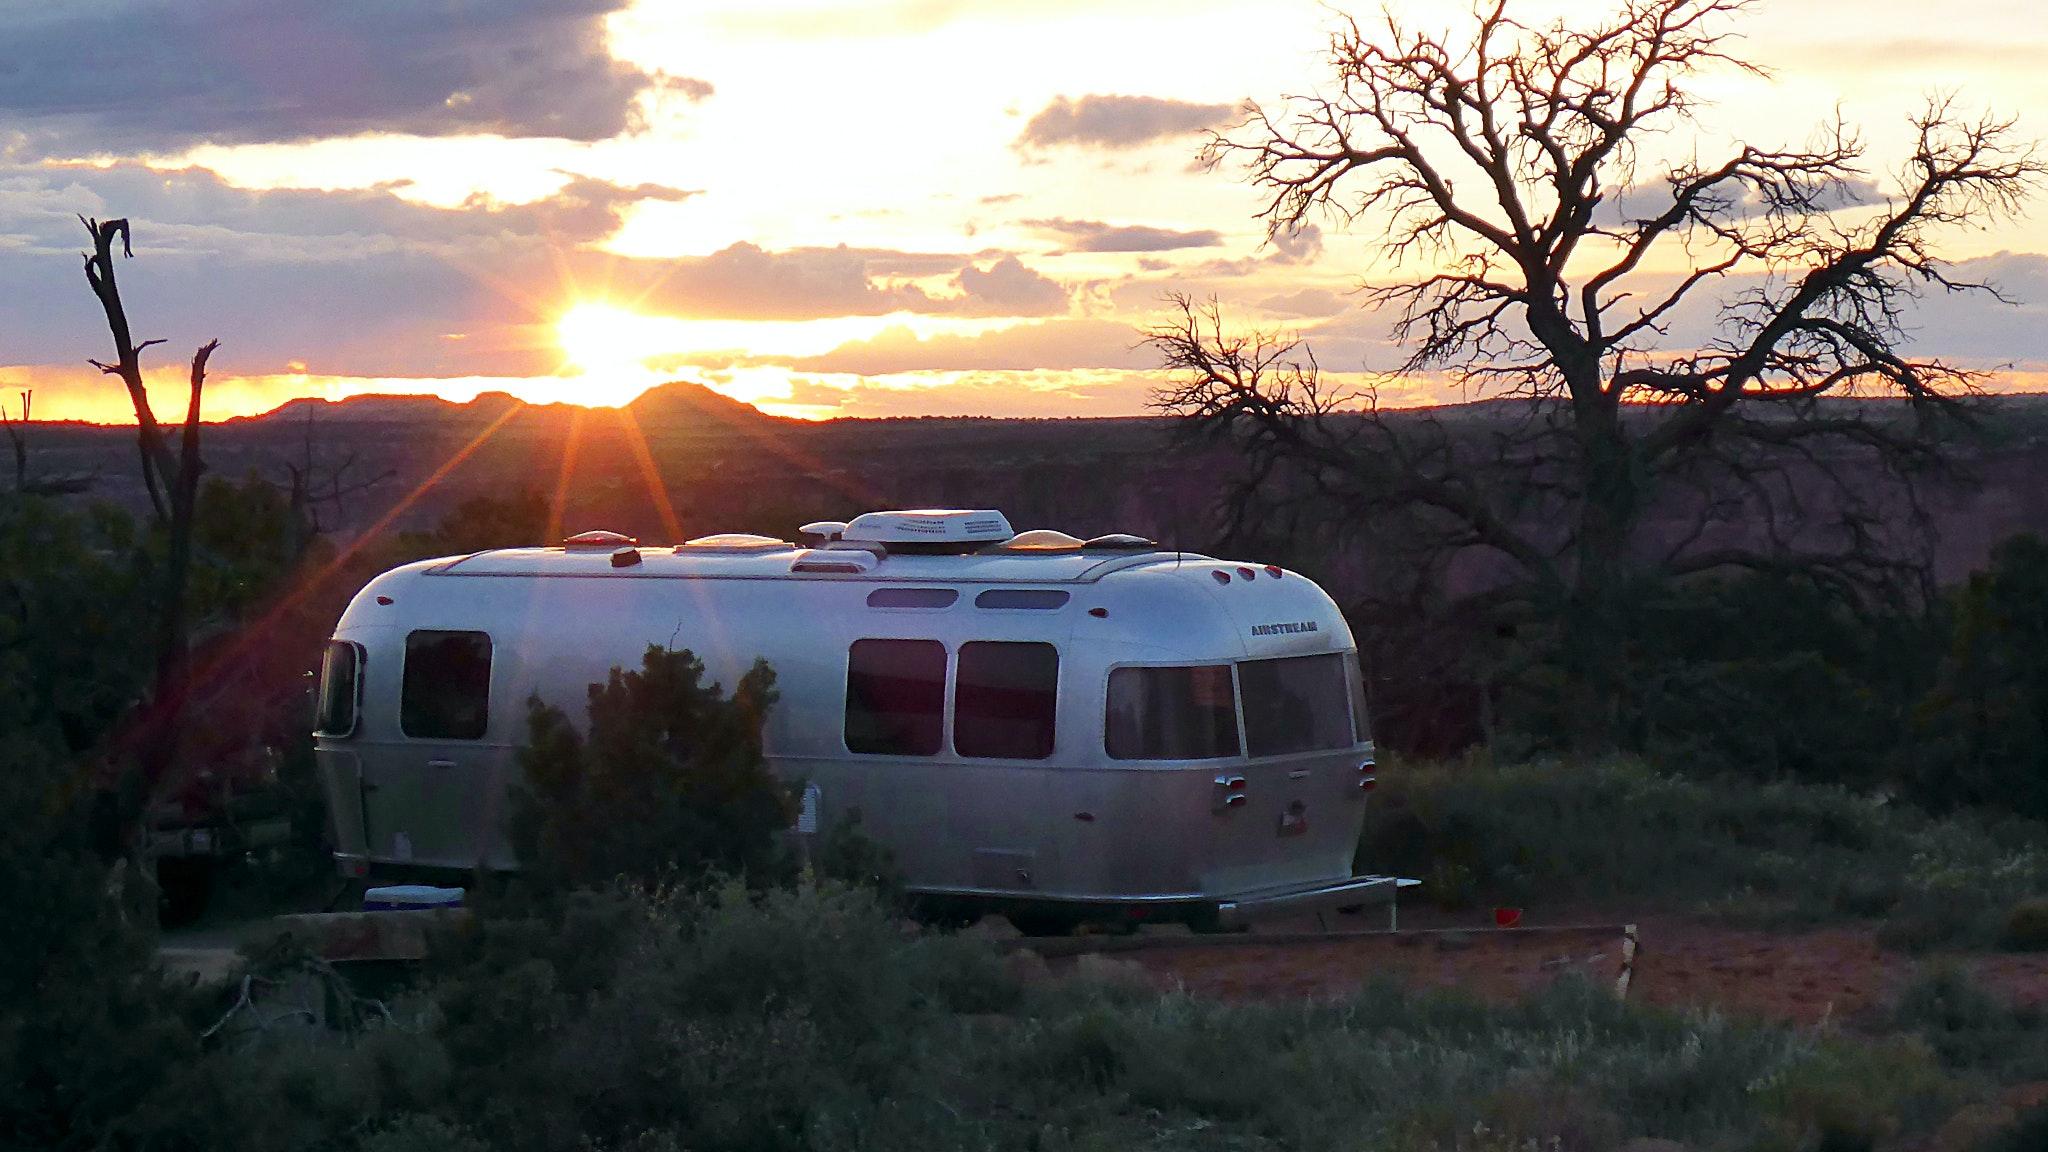 Airstream-Camping-at-Arches-National-Park